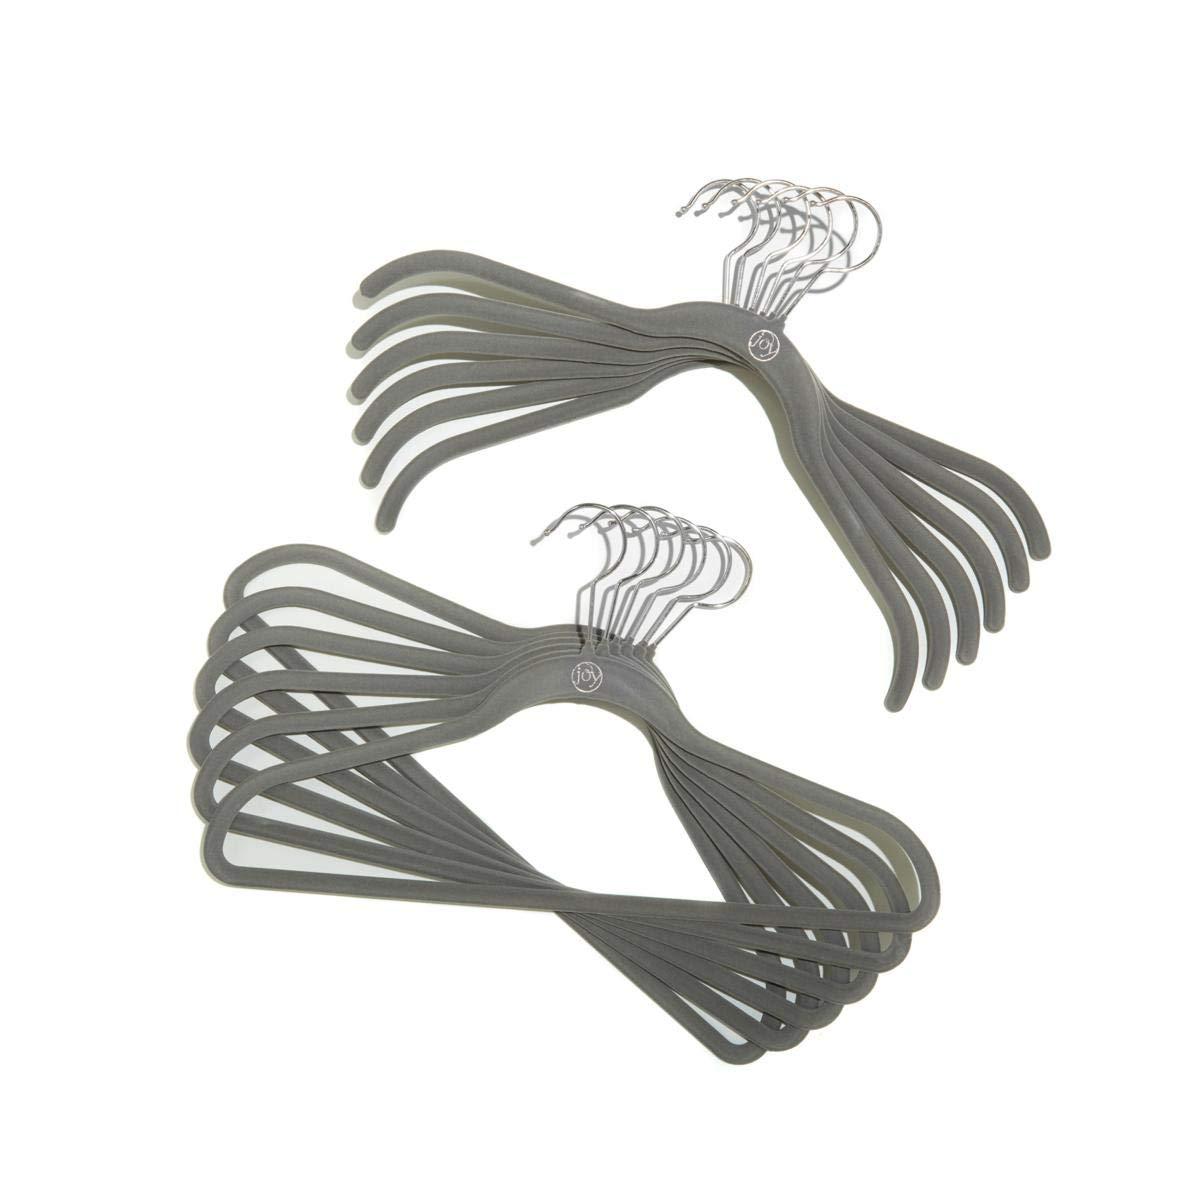 Joy Mangano Steel Gray Huggable Hangers - 100 Piece (Chrome)